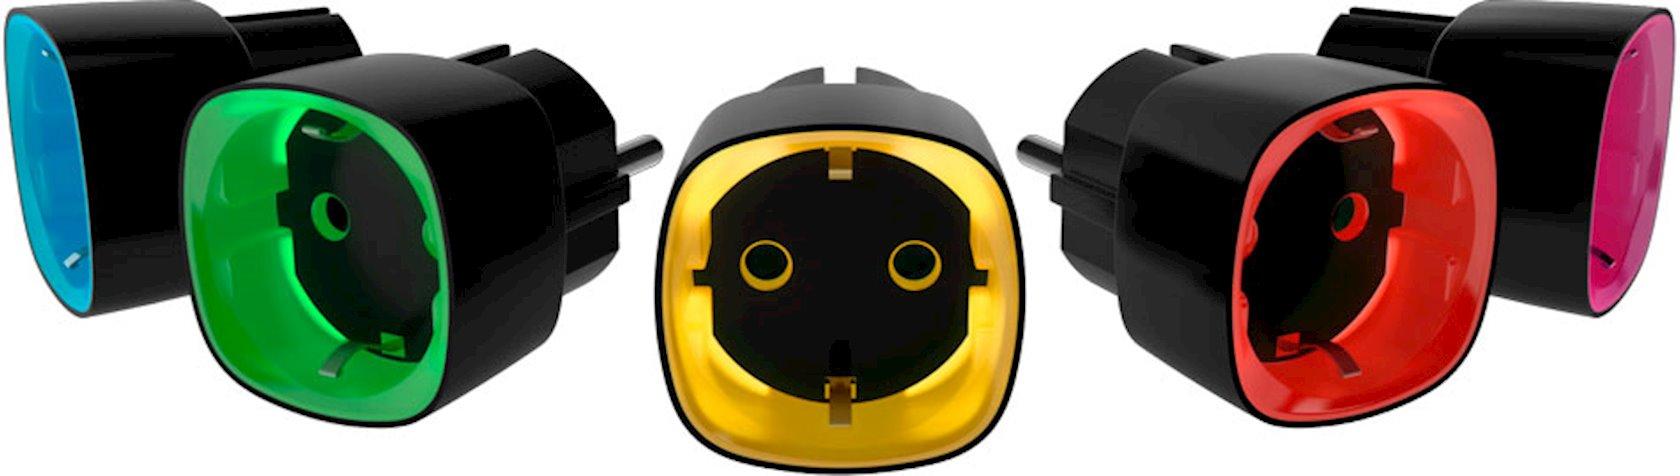 Ağıllı rozetka Ajax Socket Black